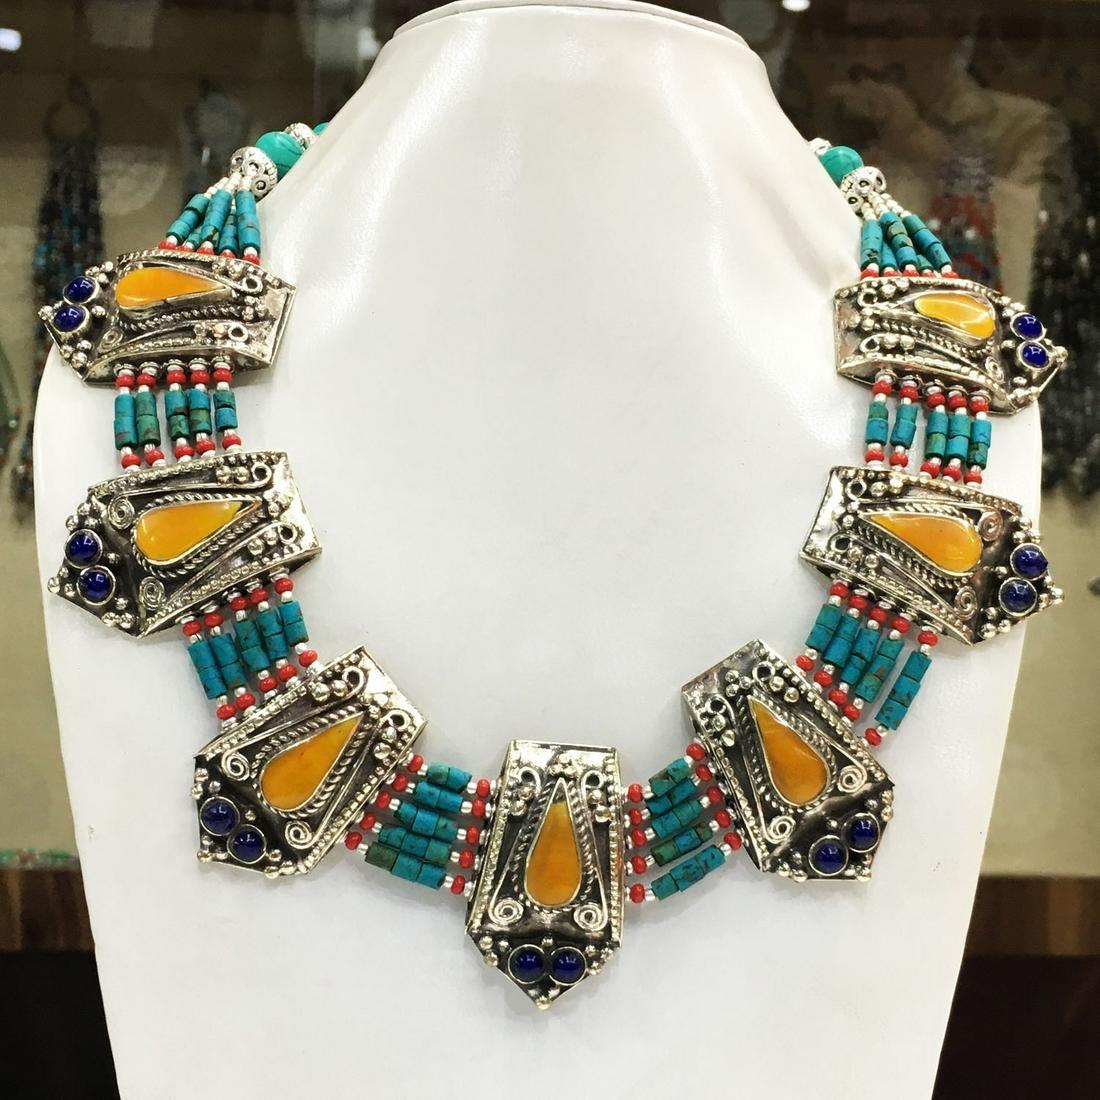 Tibetan Turquoise & Amber Handmade Chokar Necklace